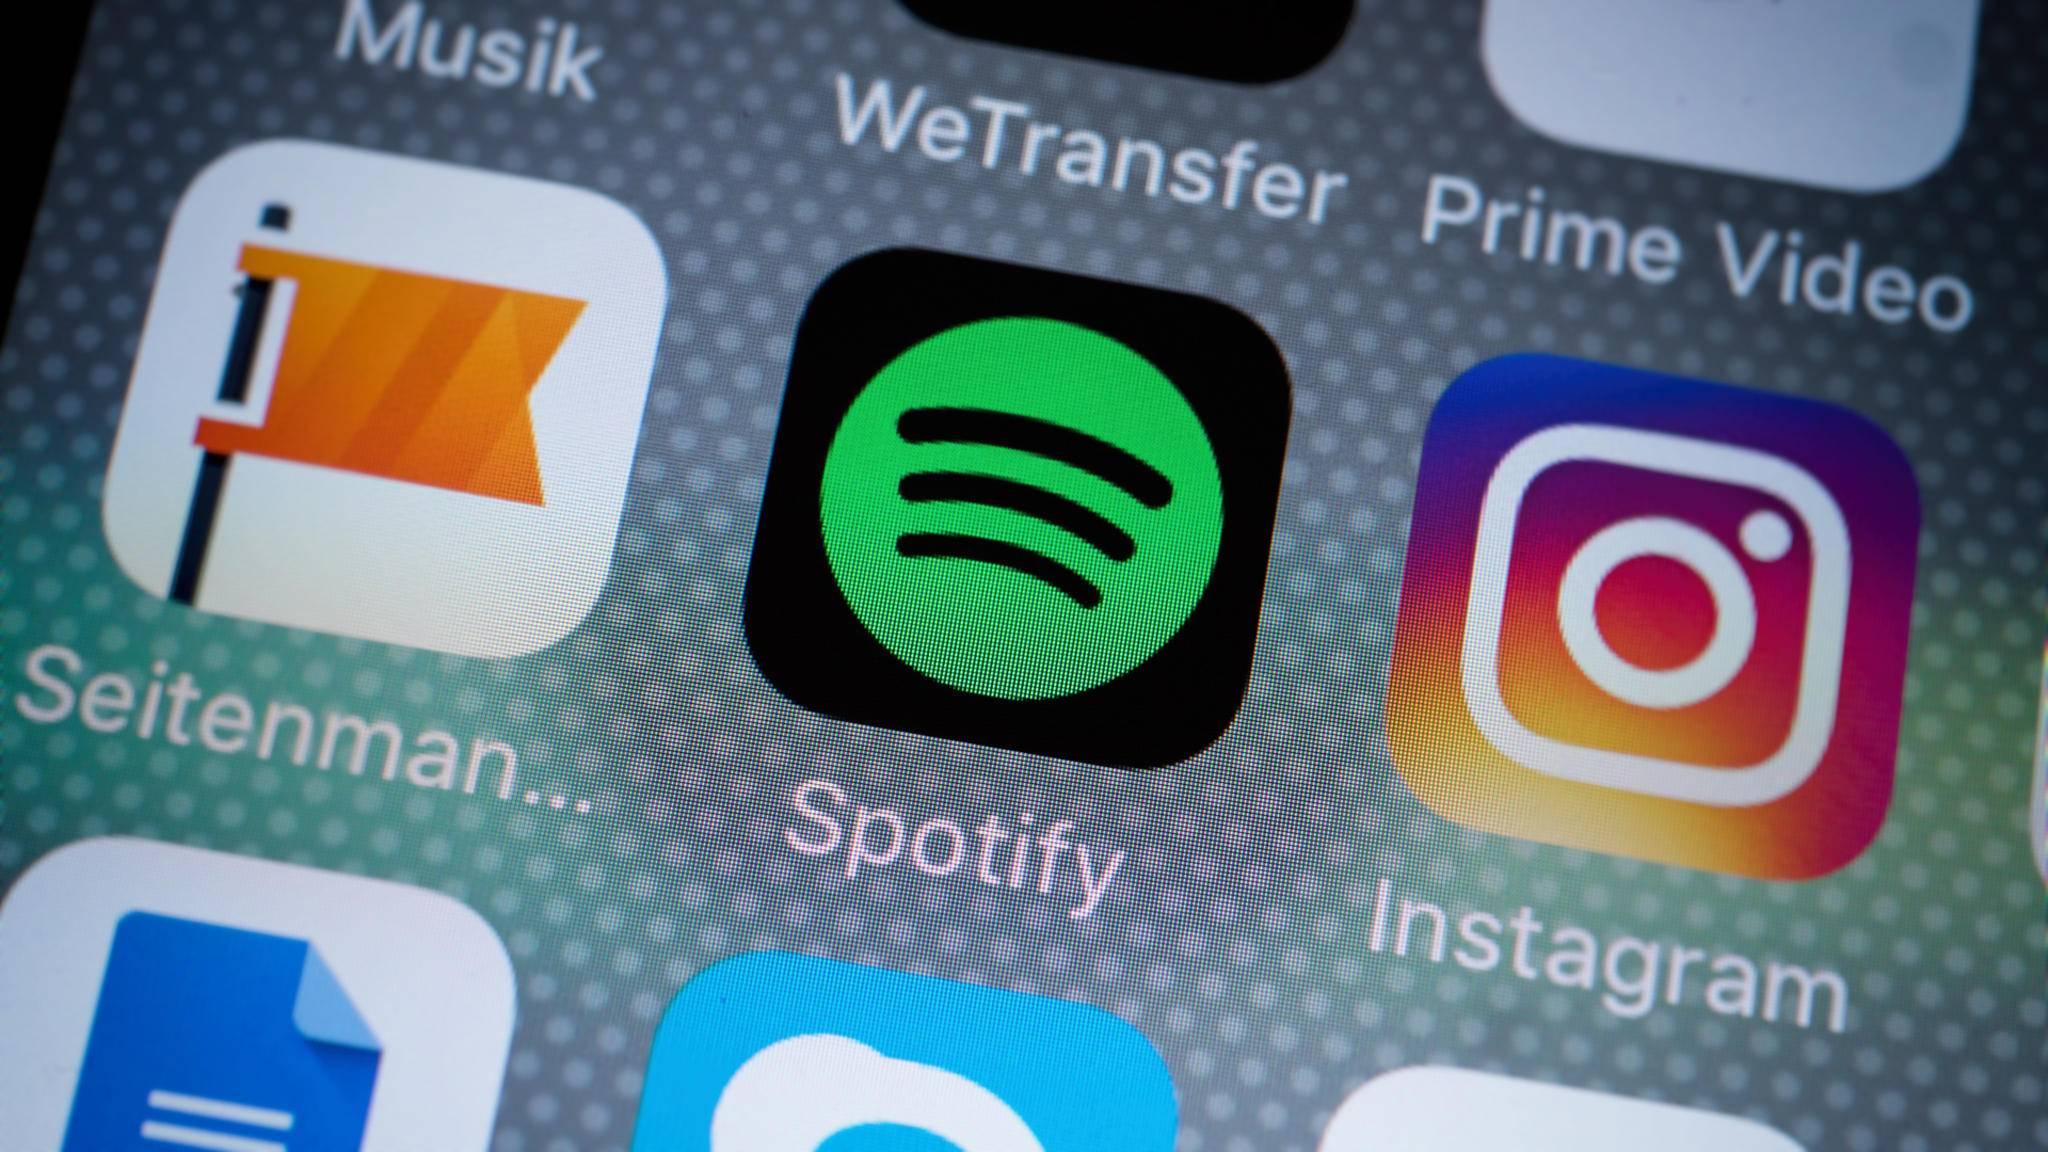 Spotify bietet kostenloses Musikstreaming.